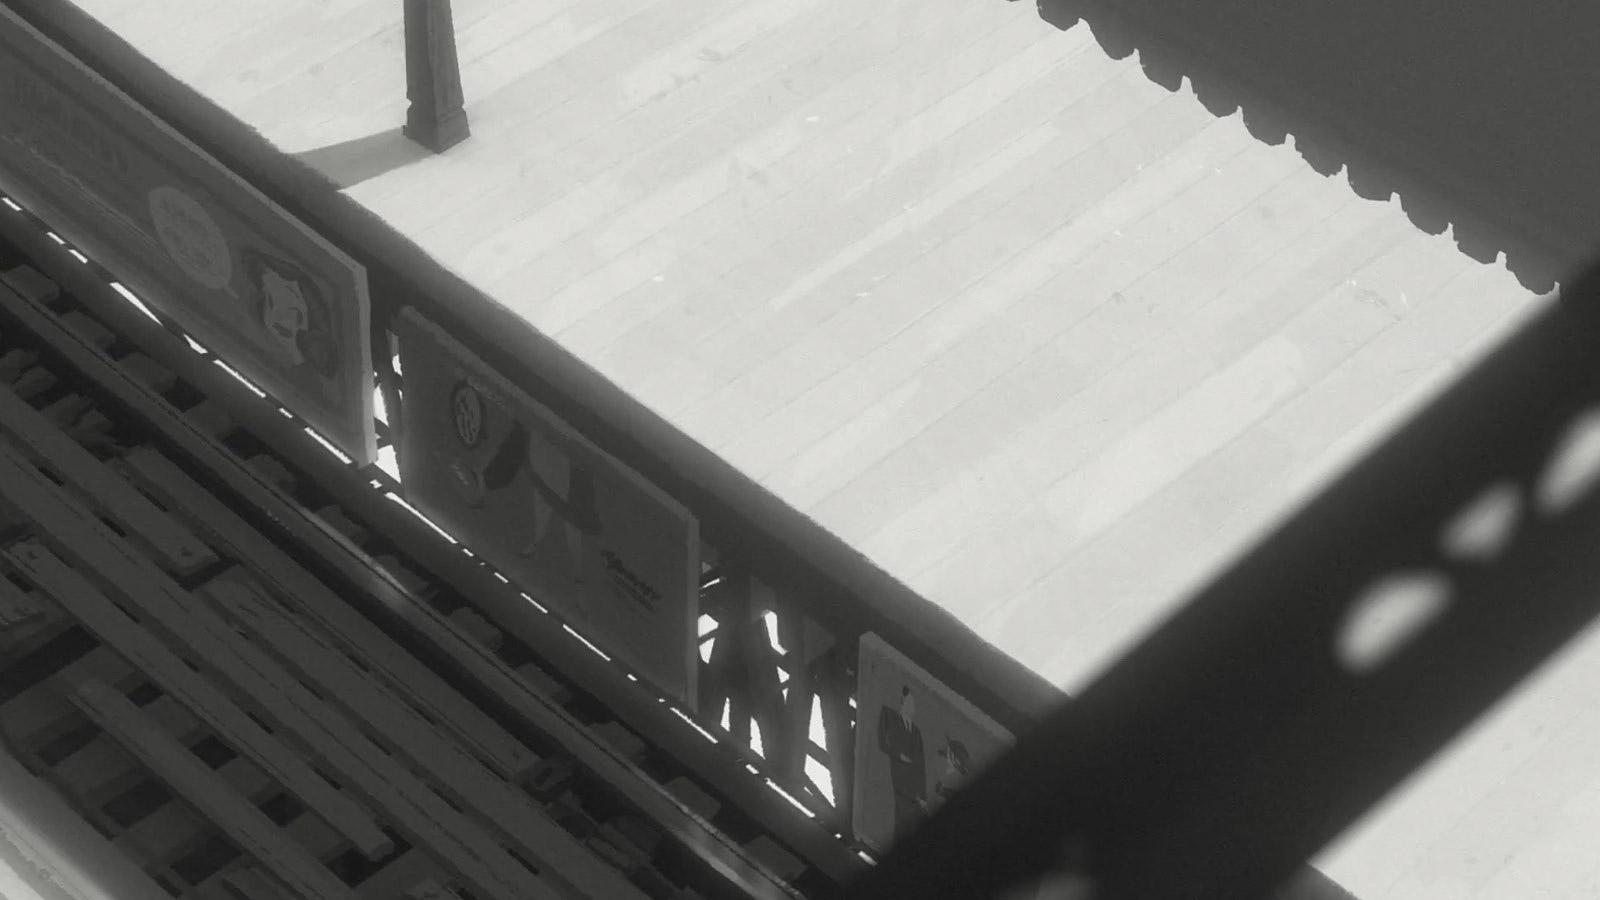 paperman-background-36.jpg